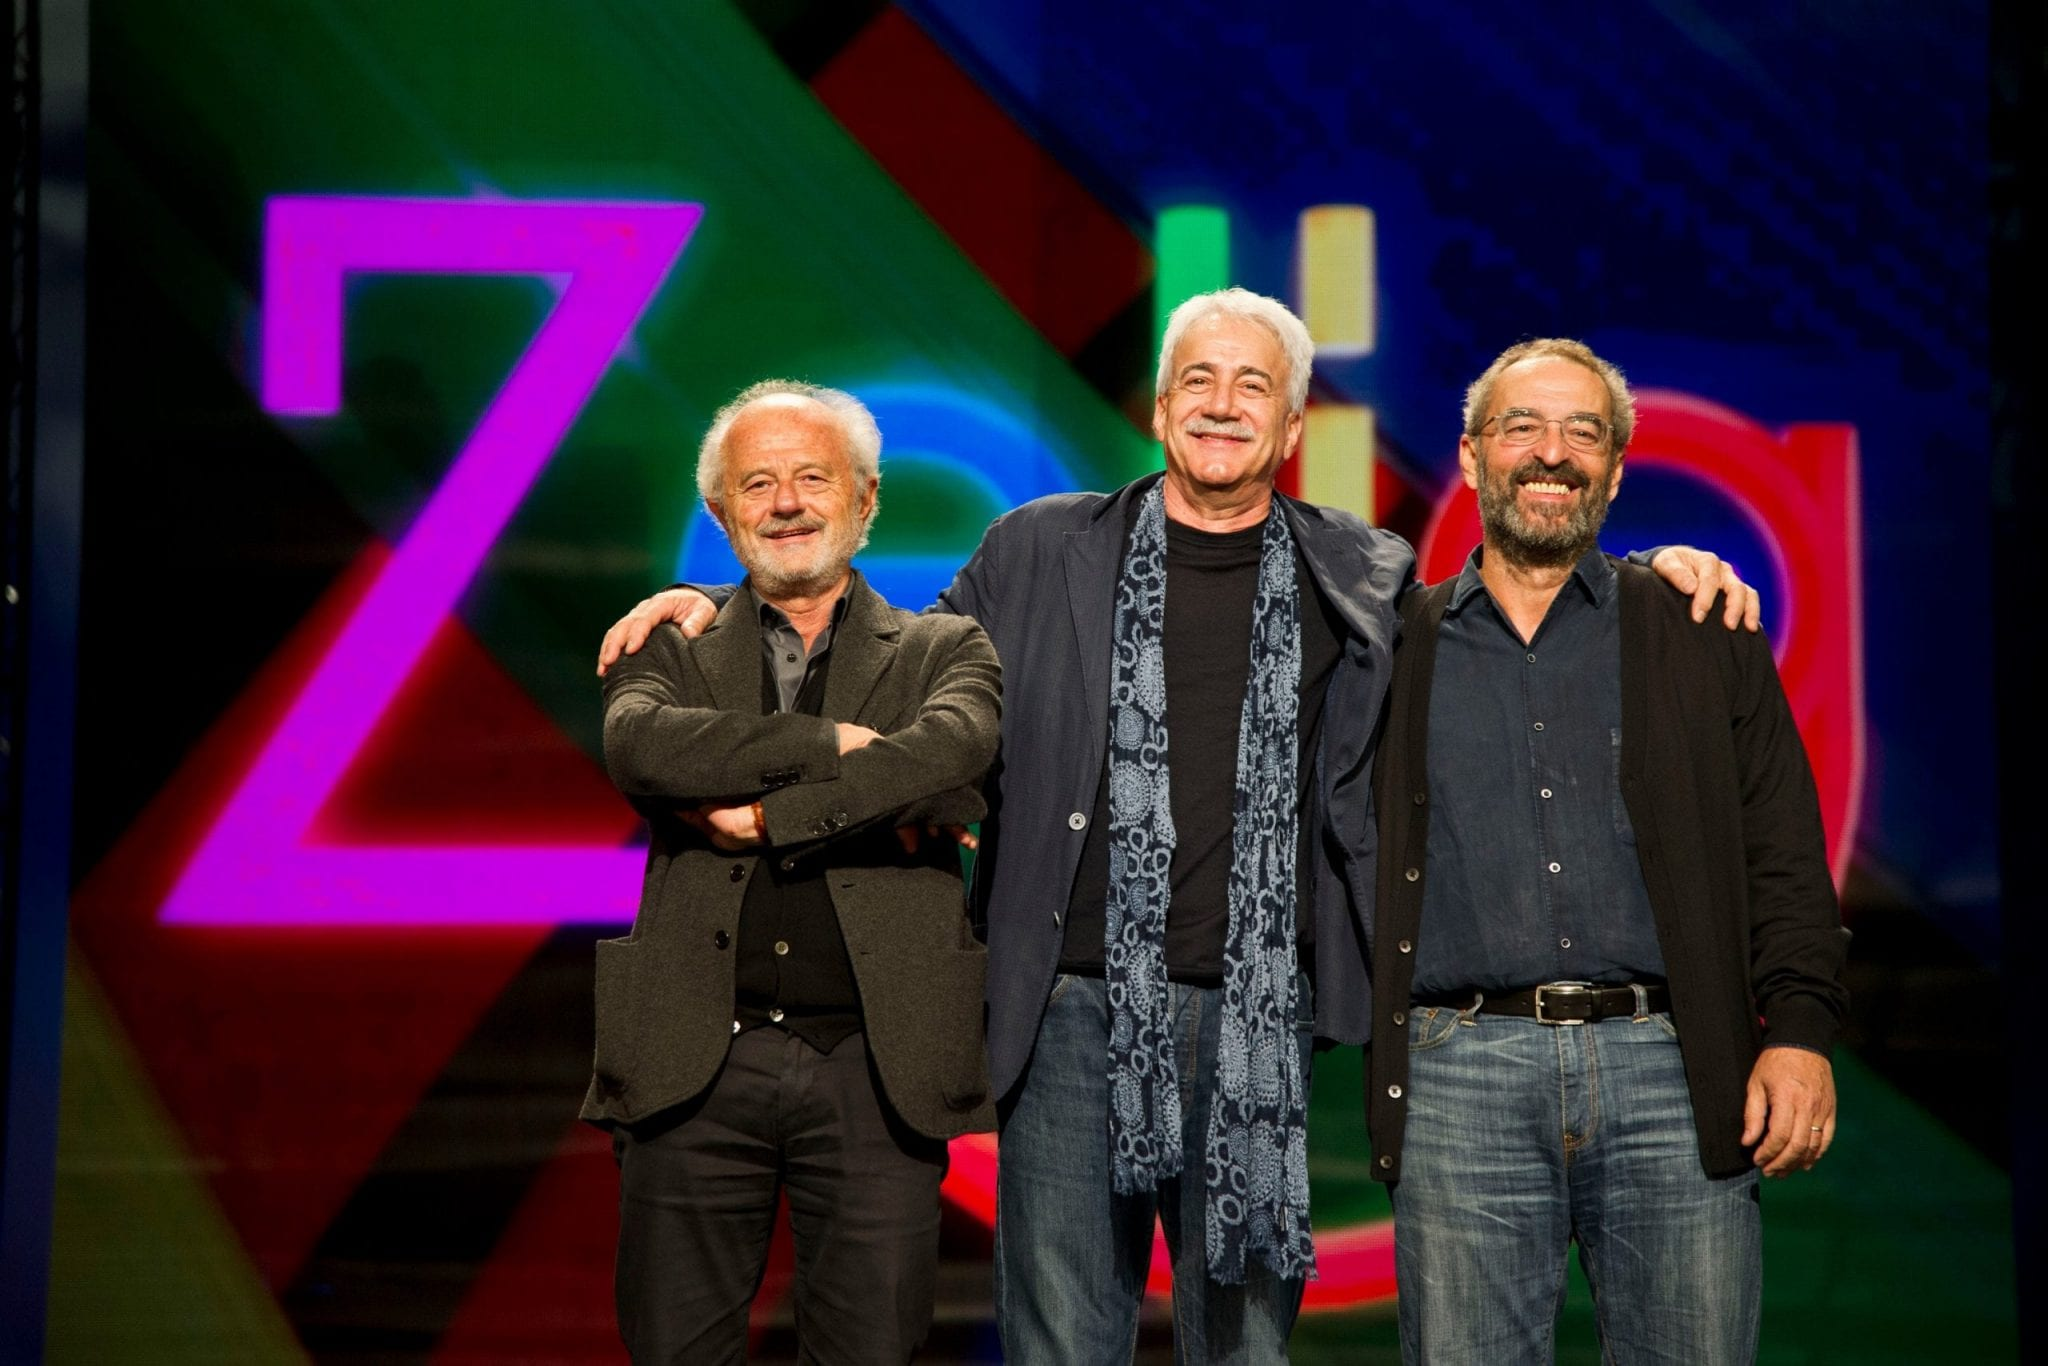 Zelig, Seconda puntata (Canale 5)